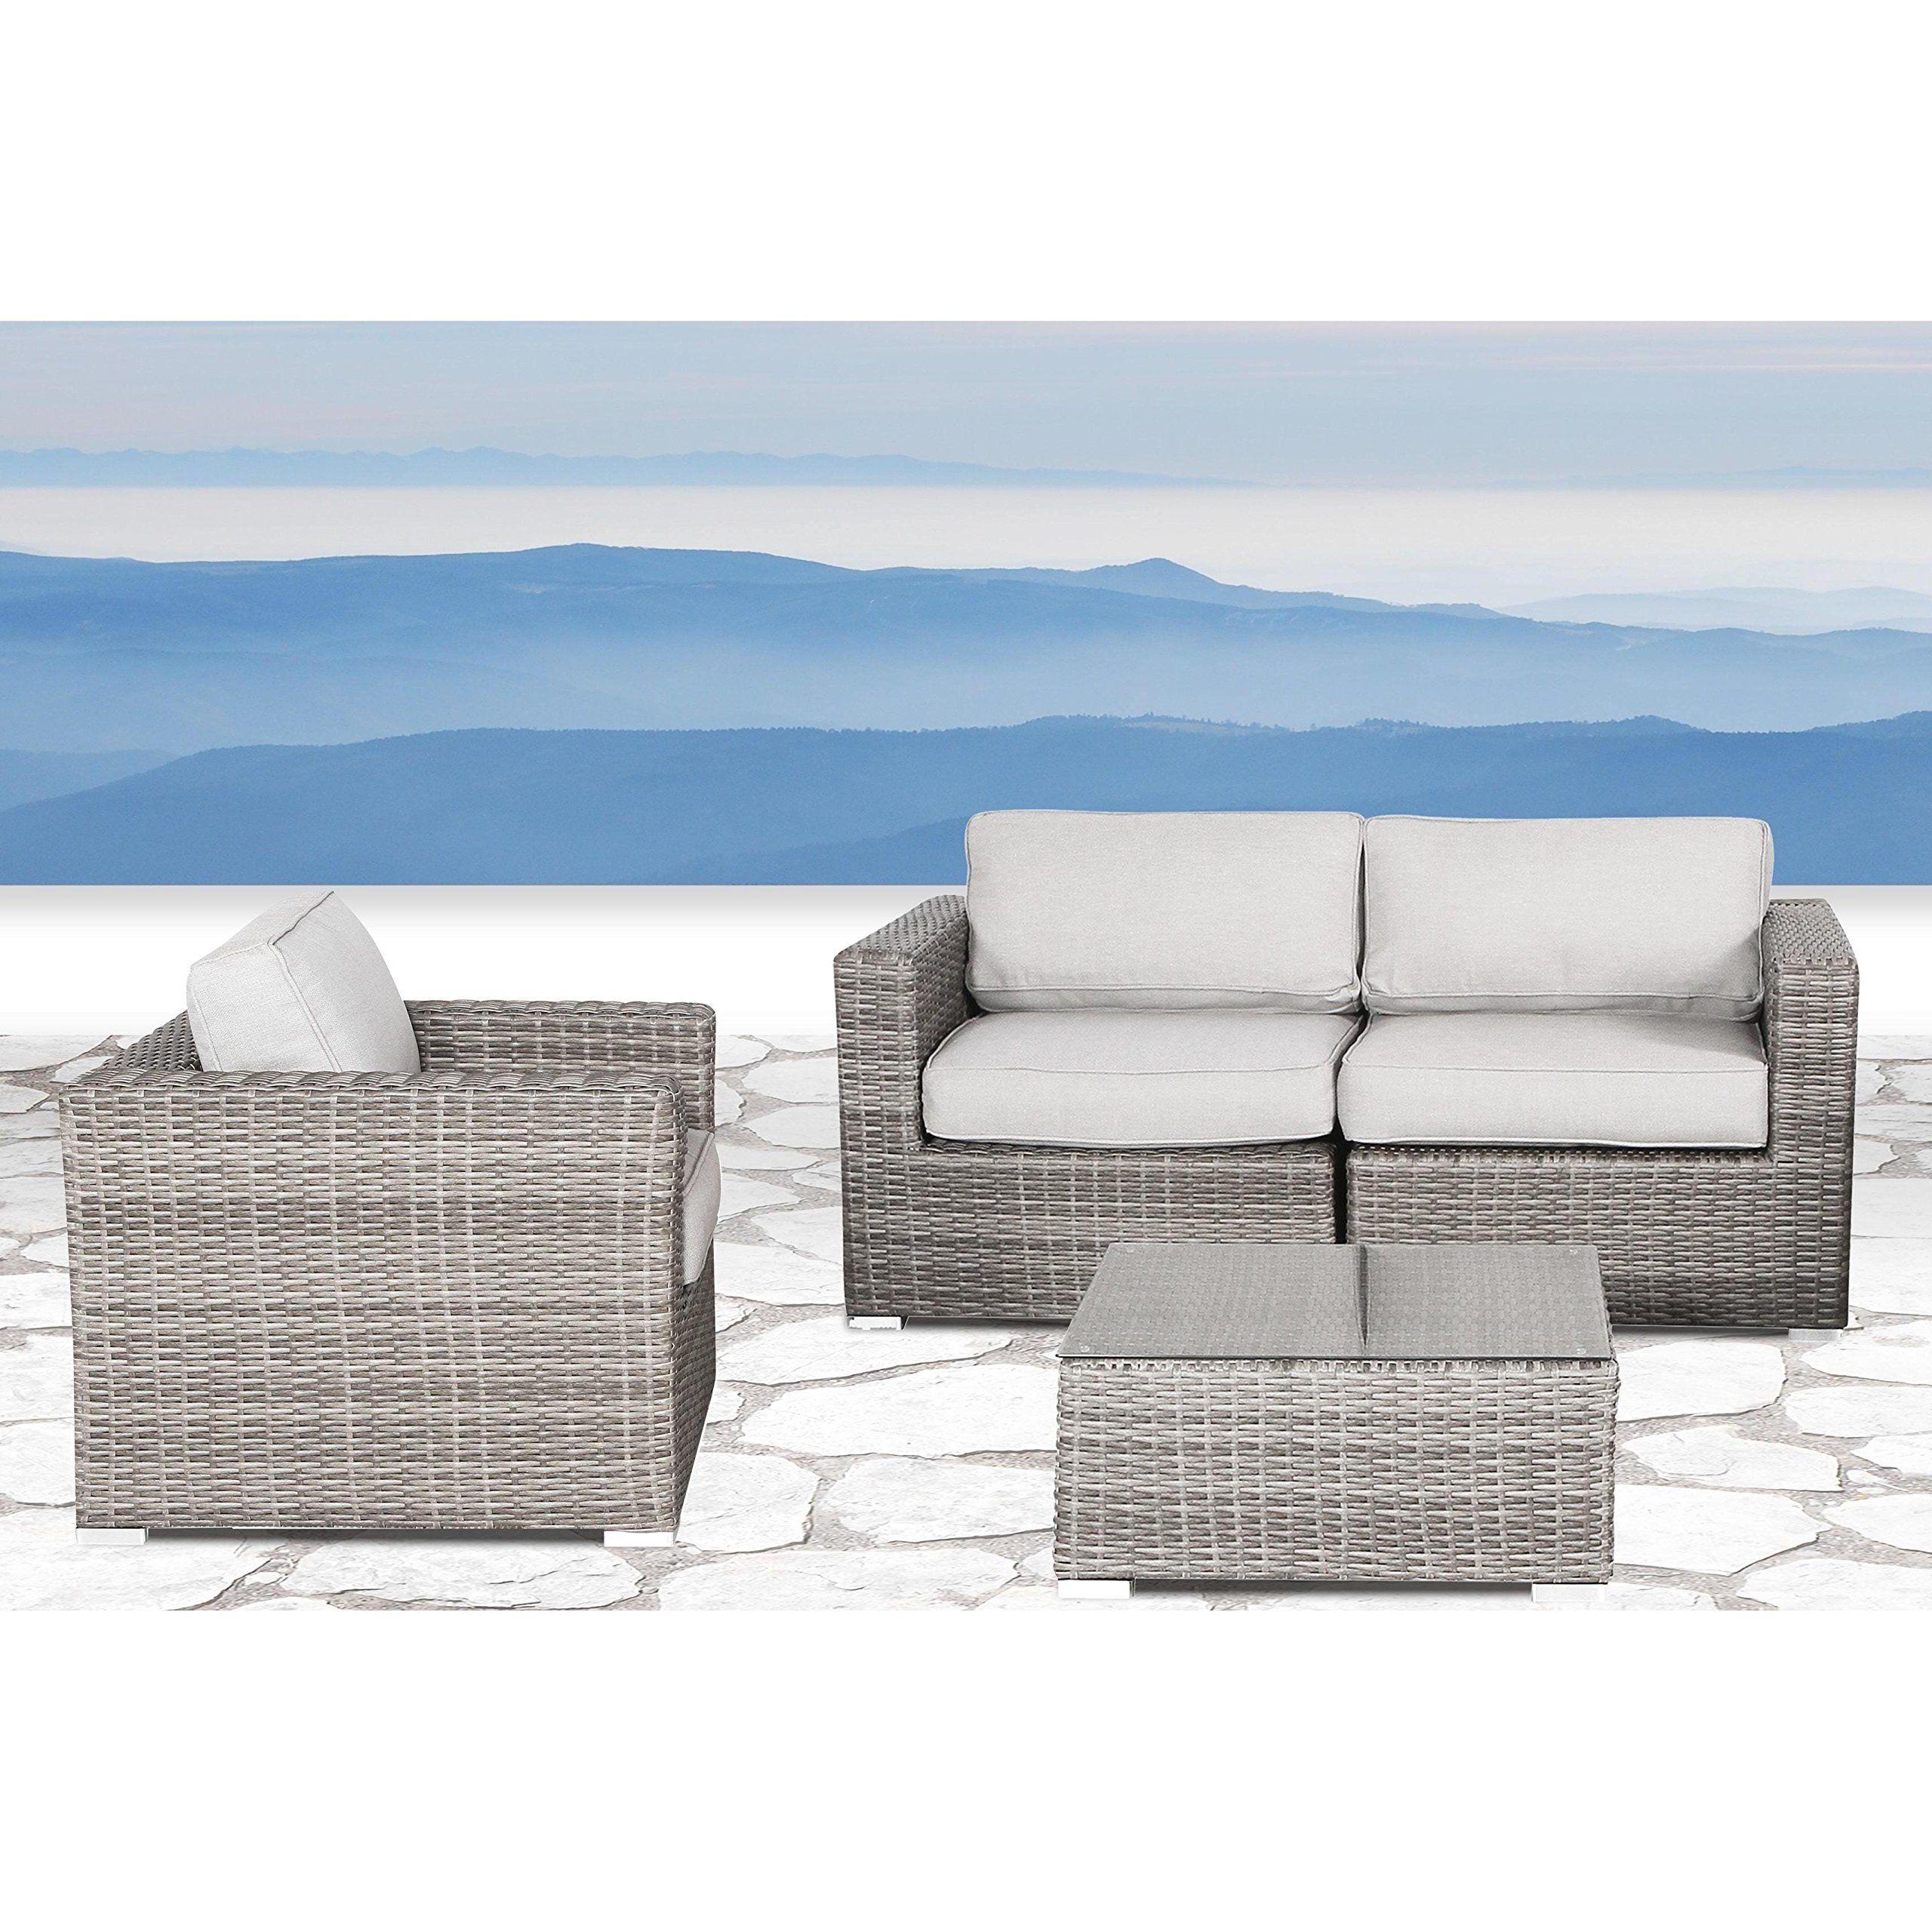 Living Source International Wicker Patio Furniture Sofa Garden